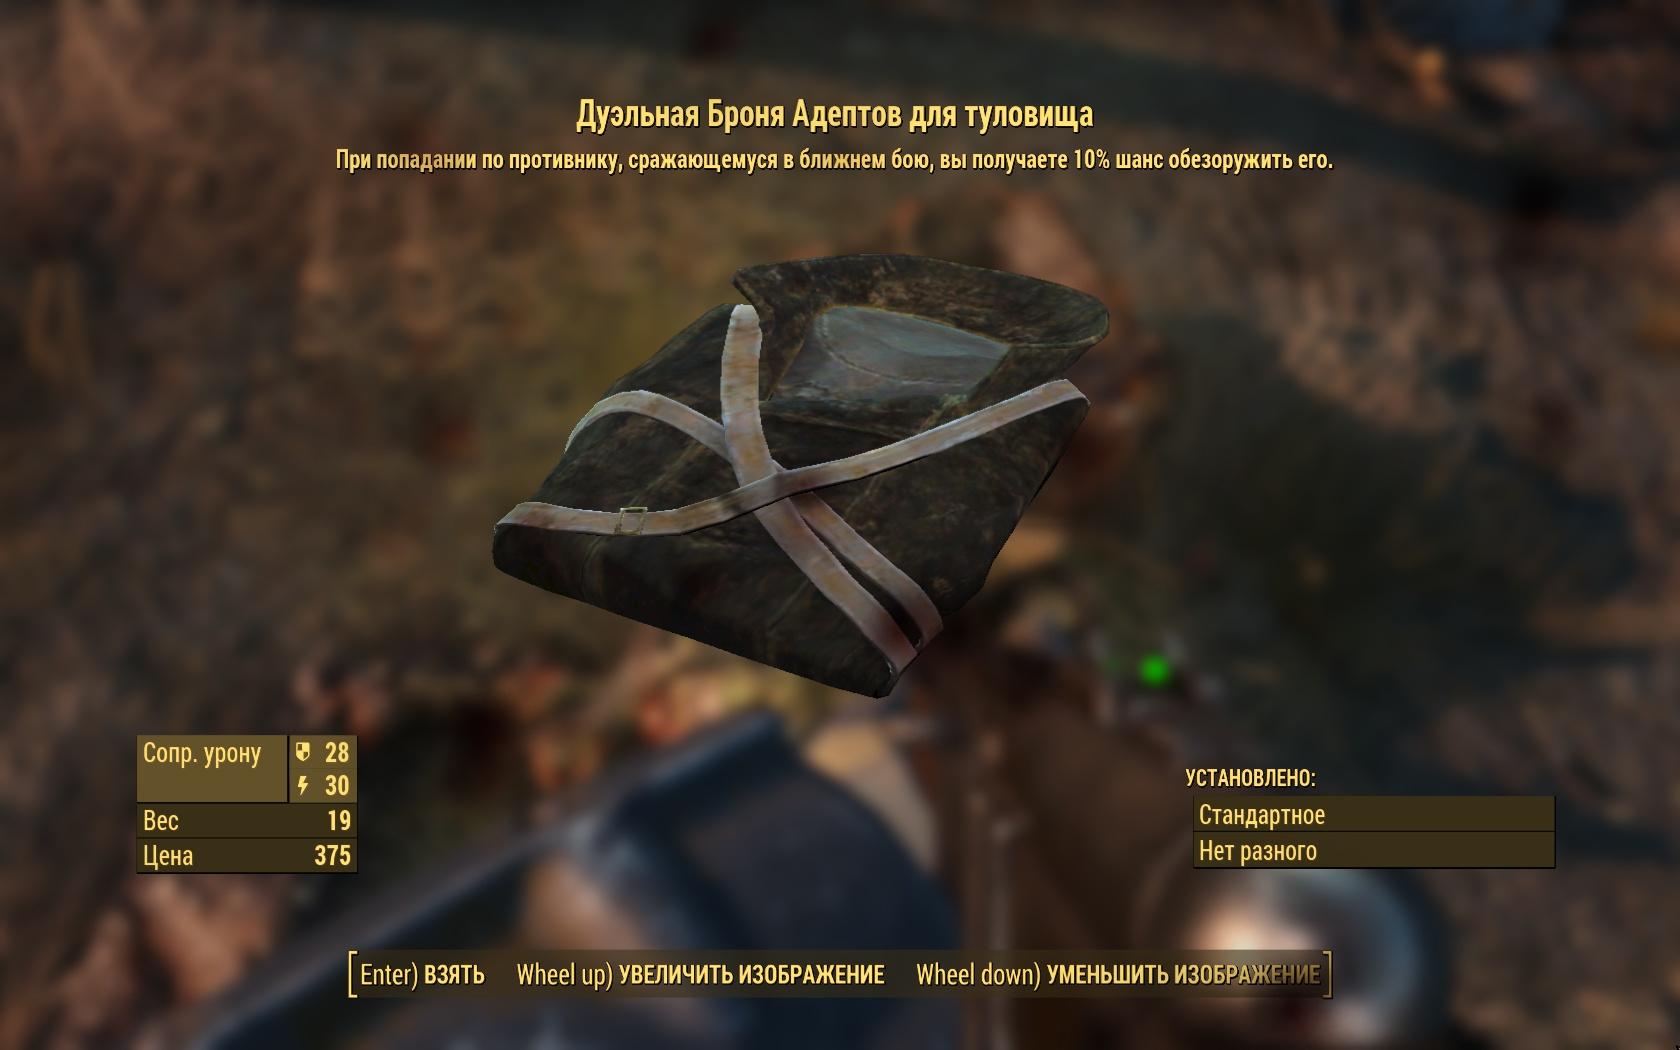 Дуэльная броня Адептов для туловища - Fallout 4 броня, Дуэльная, Одежда